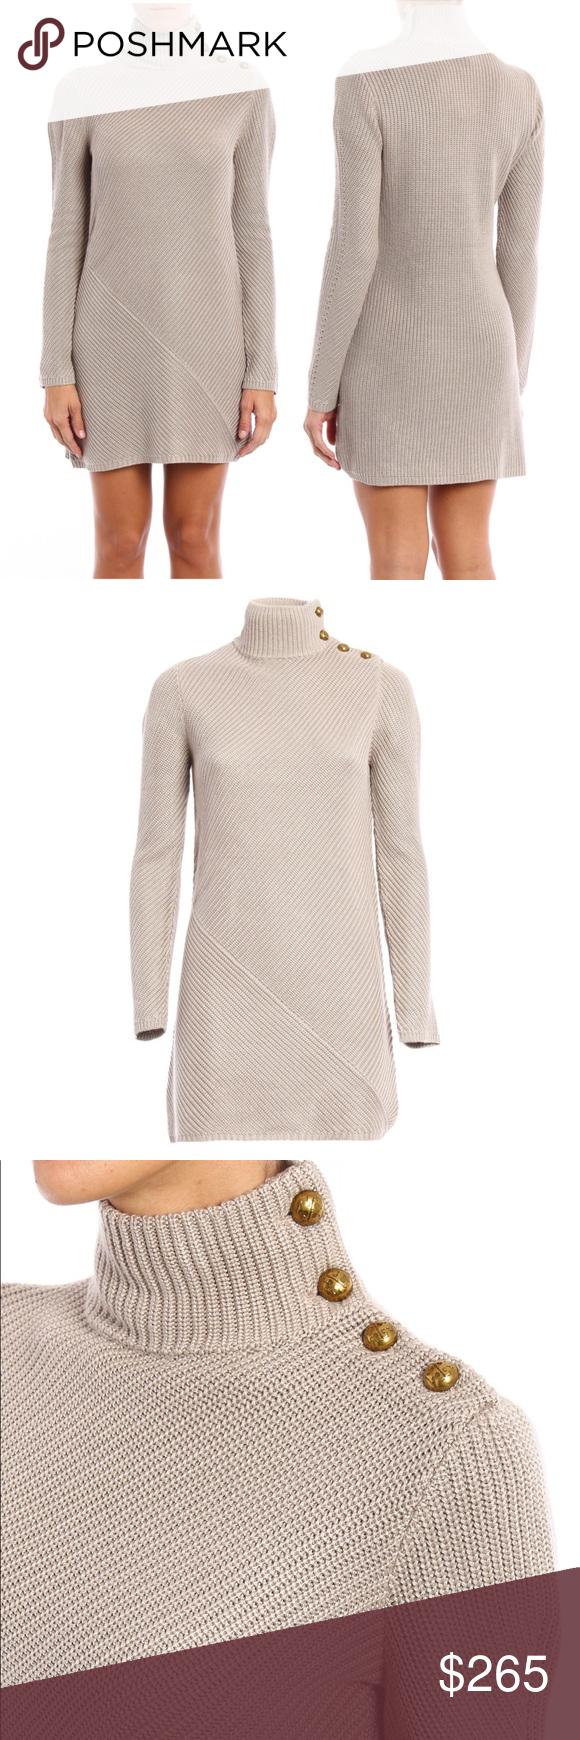 c4a6f817597 Tory Burch Brodie tunic dress Turtleneck collared knit dress 70 viscose 30  acrylic ✨stunning button detail✨ Tory Burch Dresses Mini